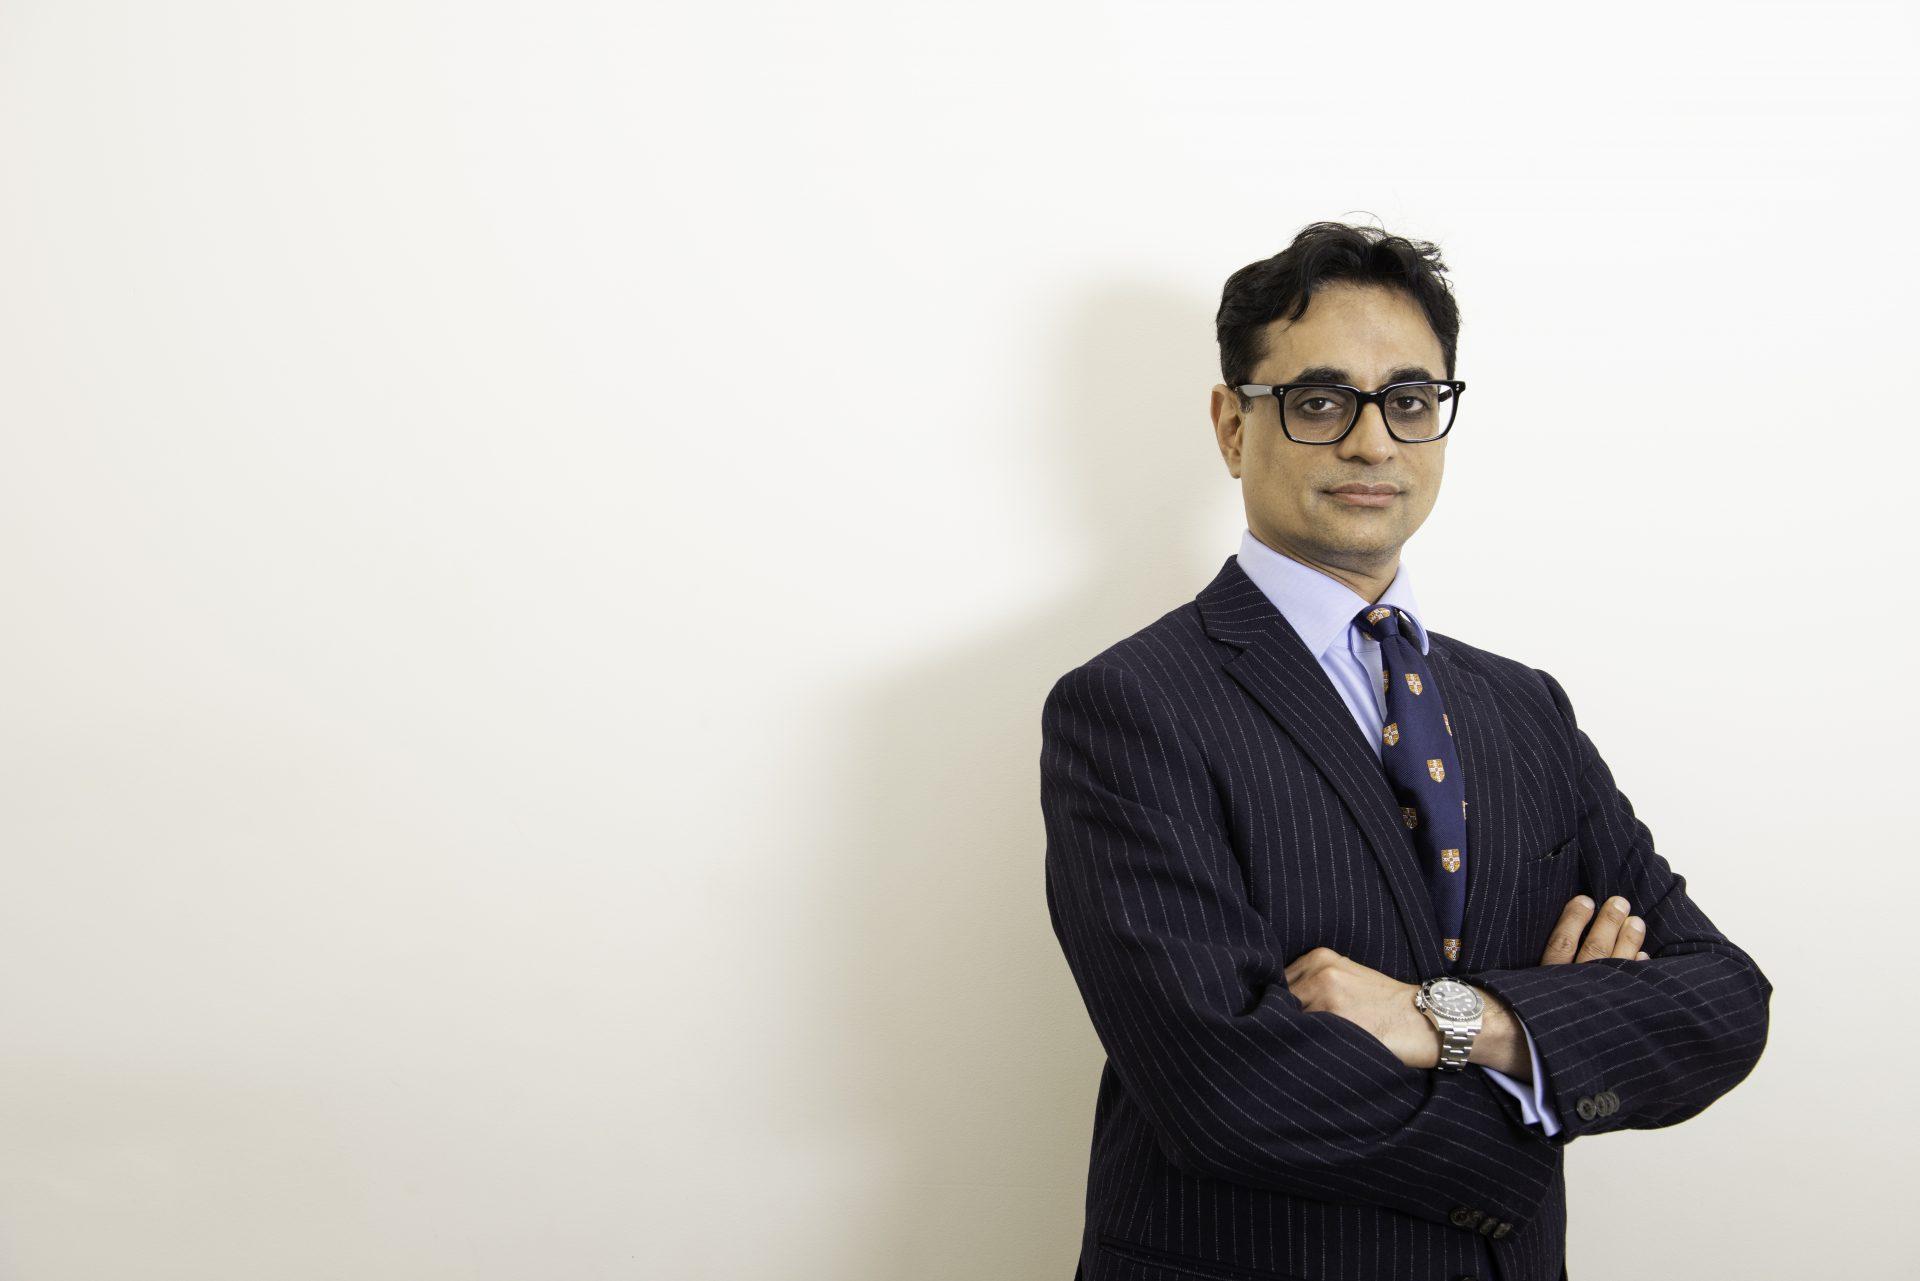 Mr. Sarvpreet Singh